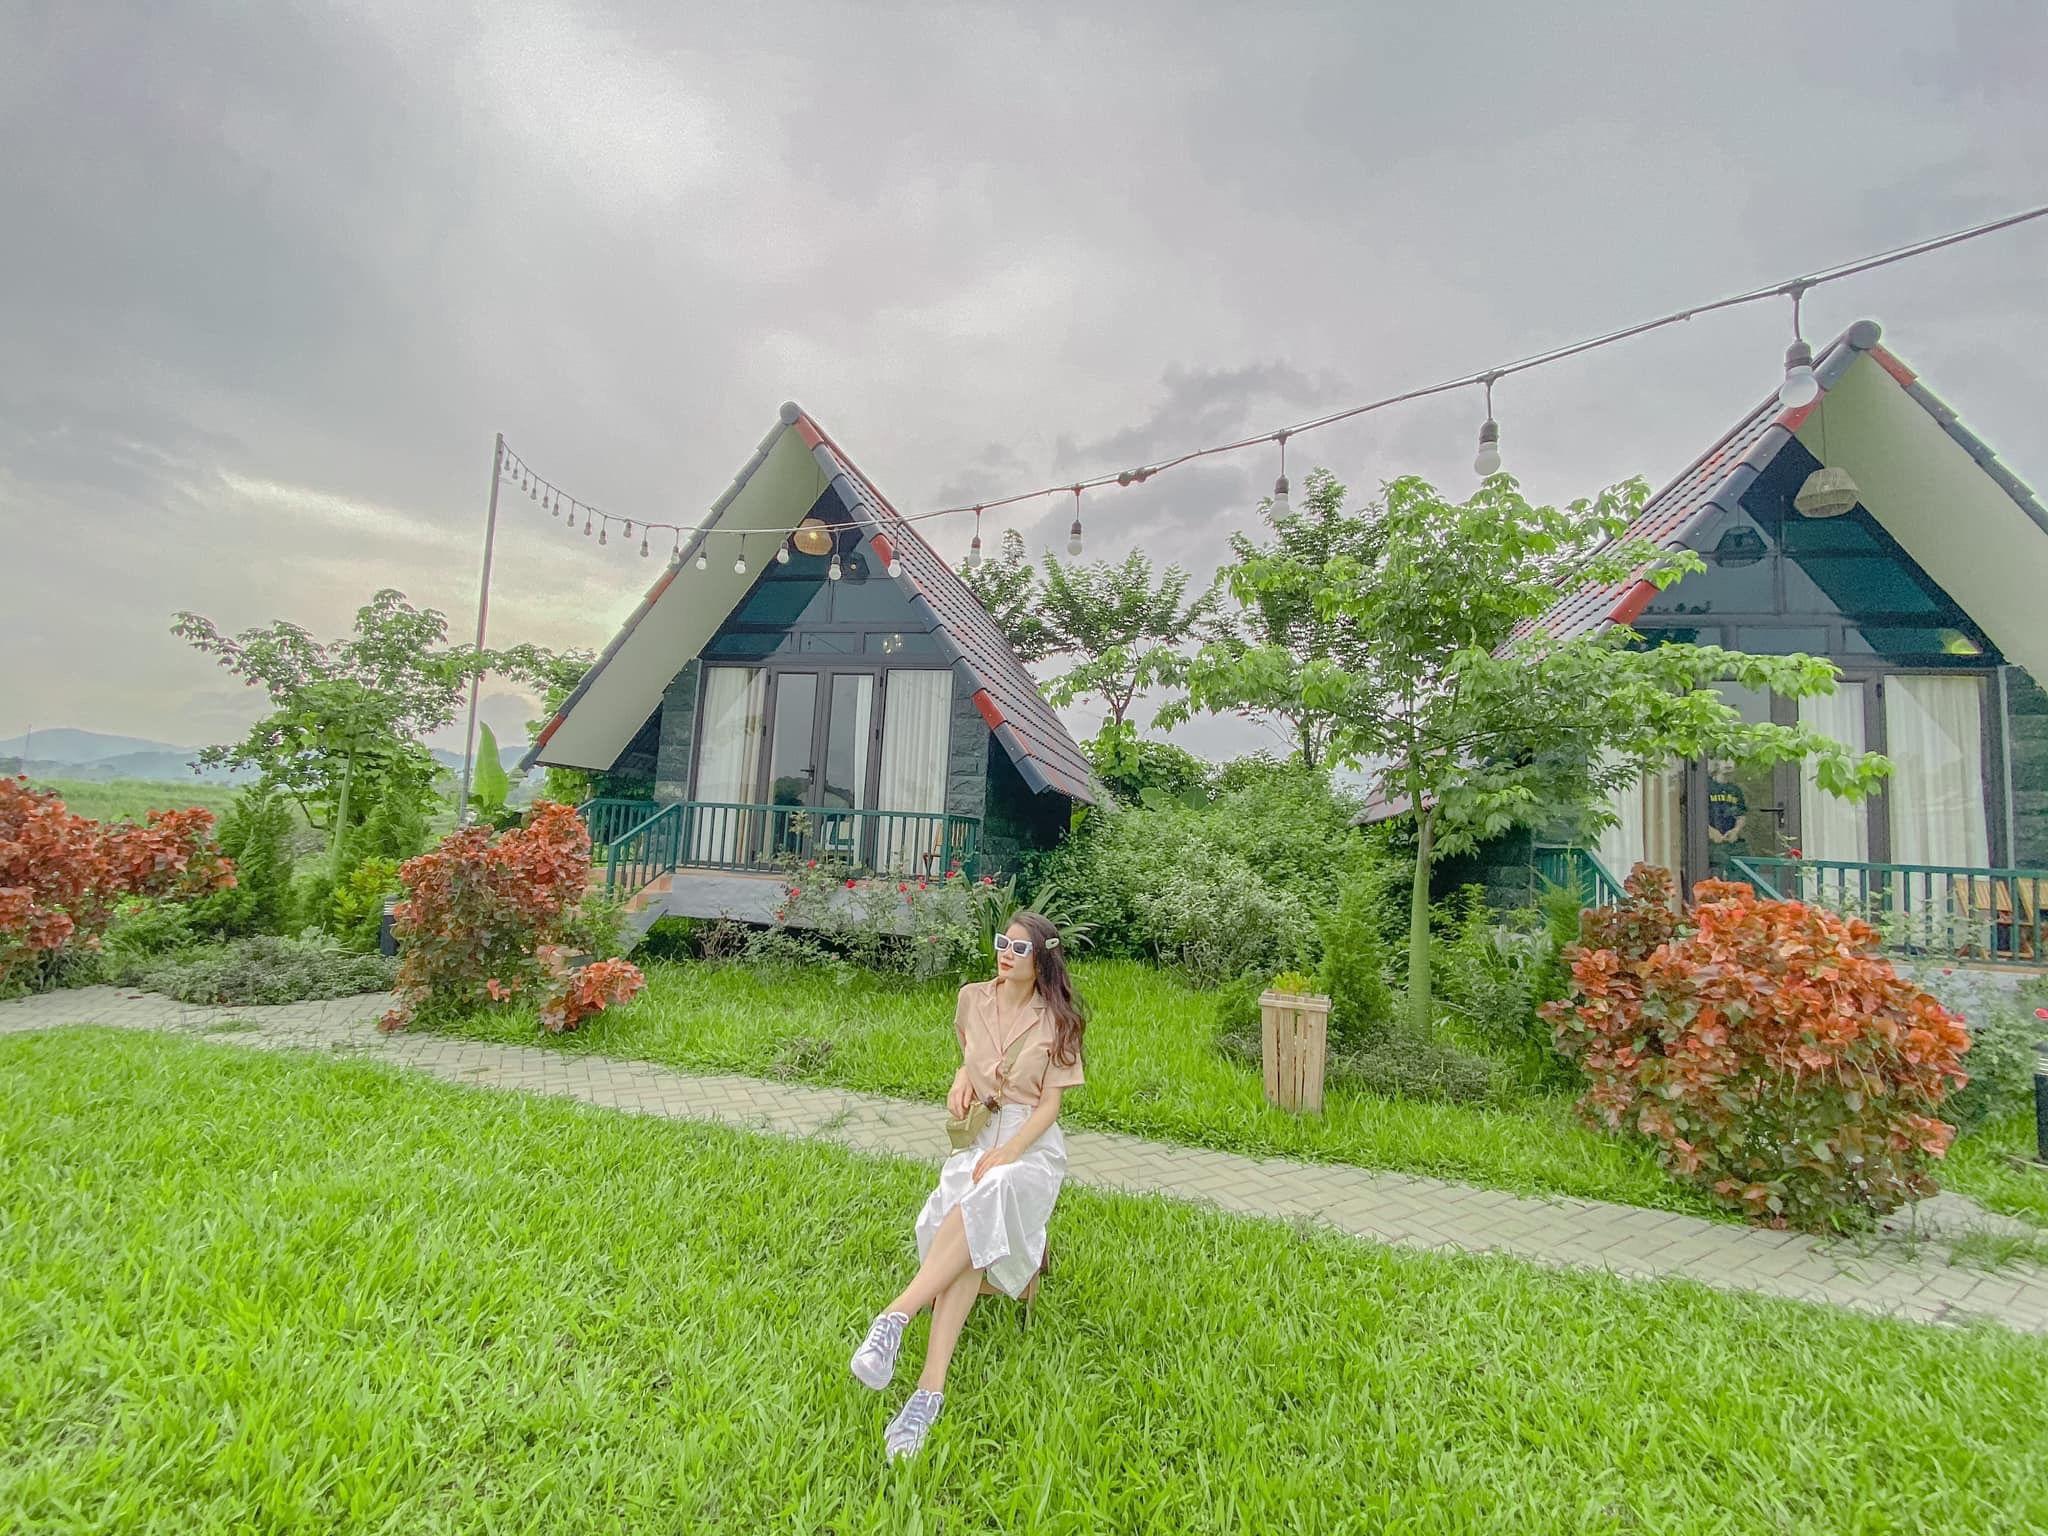 goc-chup-bungalow-sen-villas-homestay-ba-vi-ha-noi-02